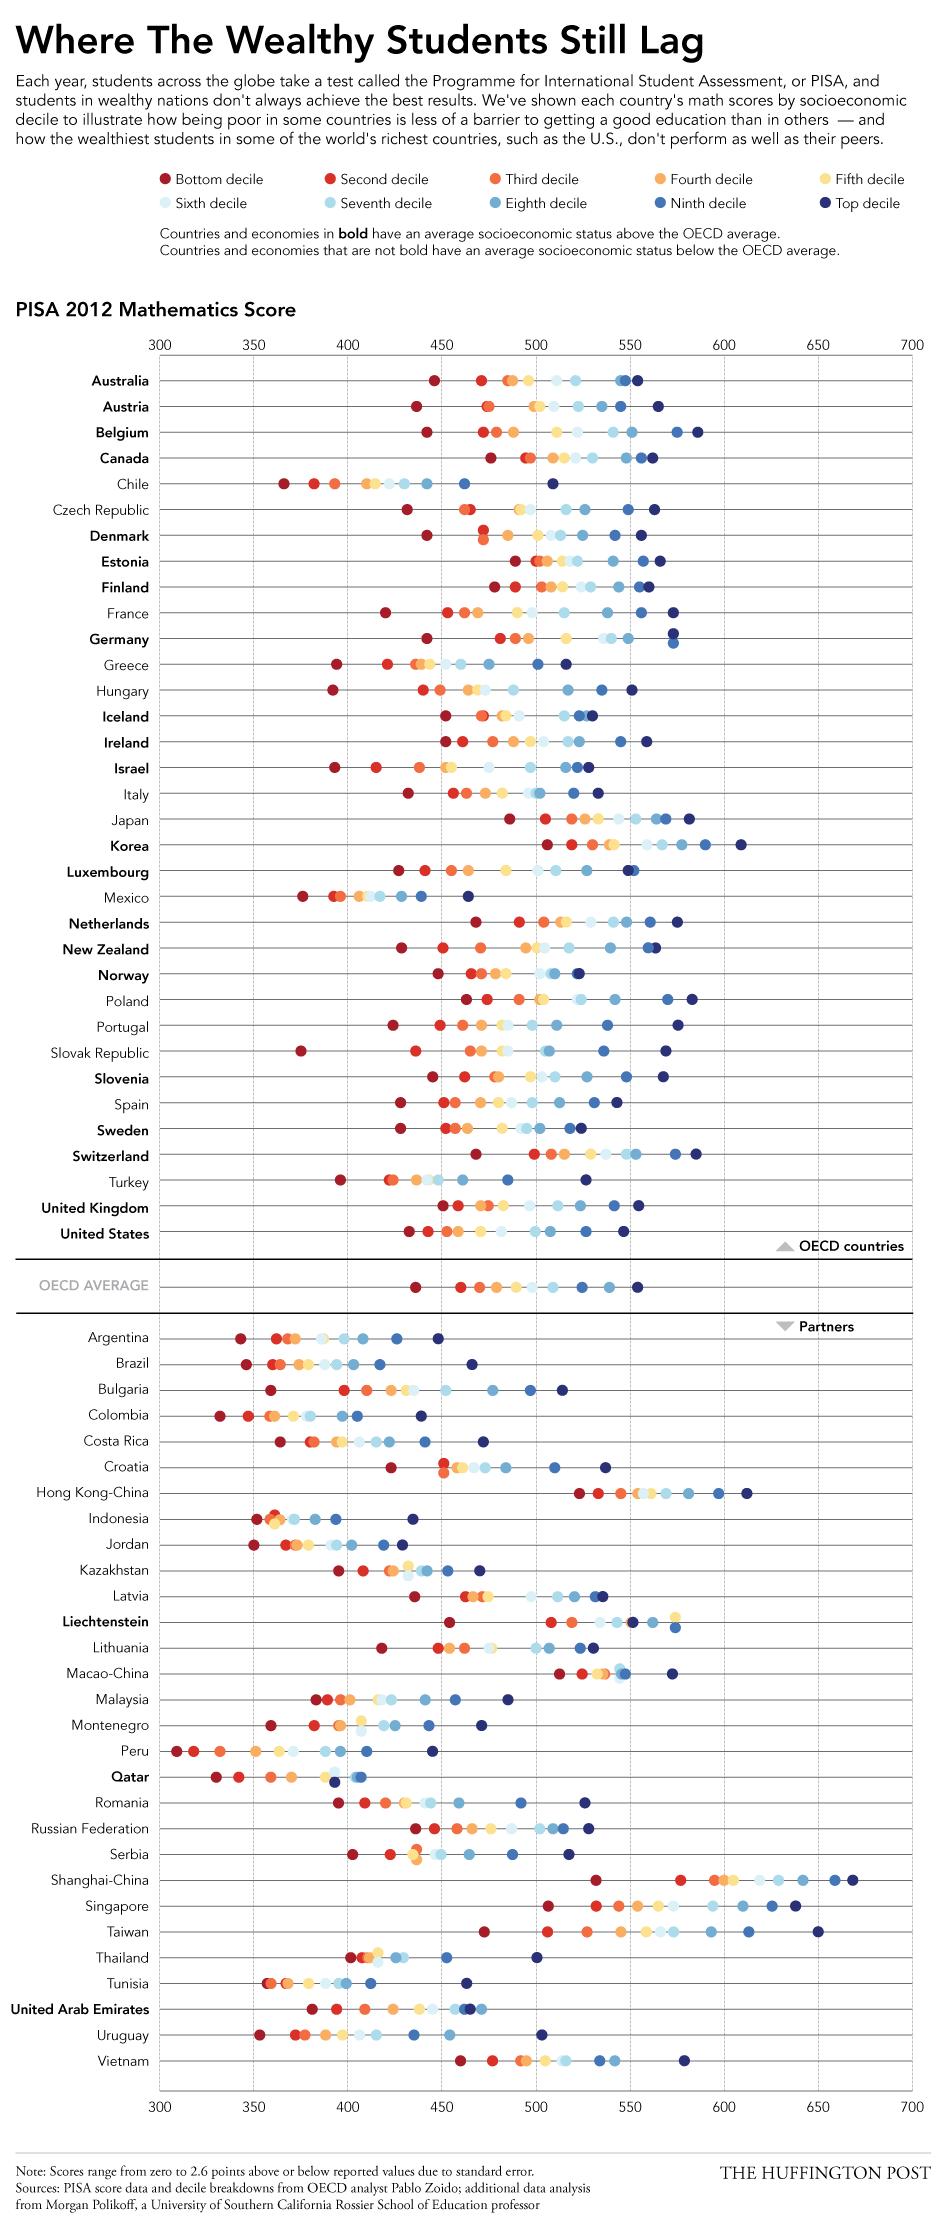 OECD decile scores